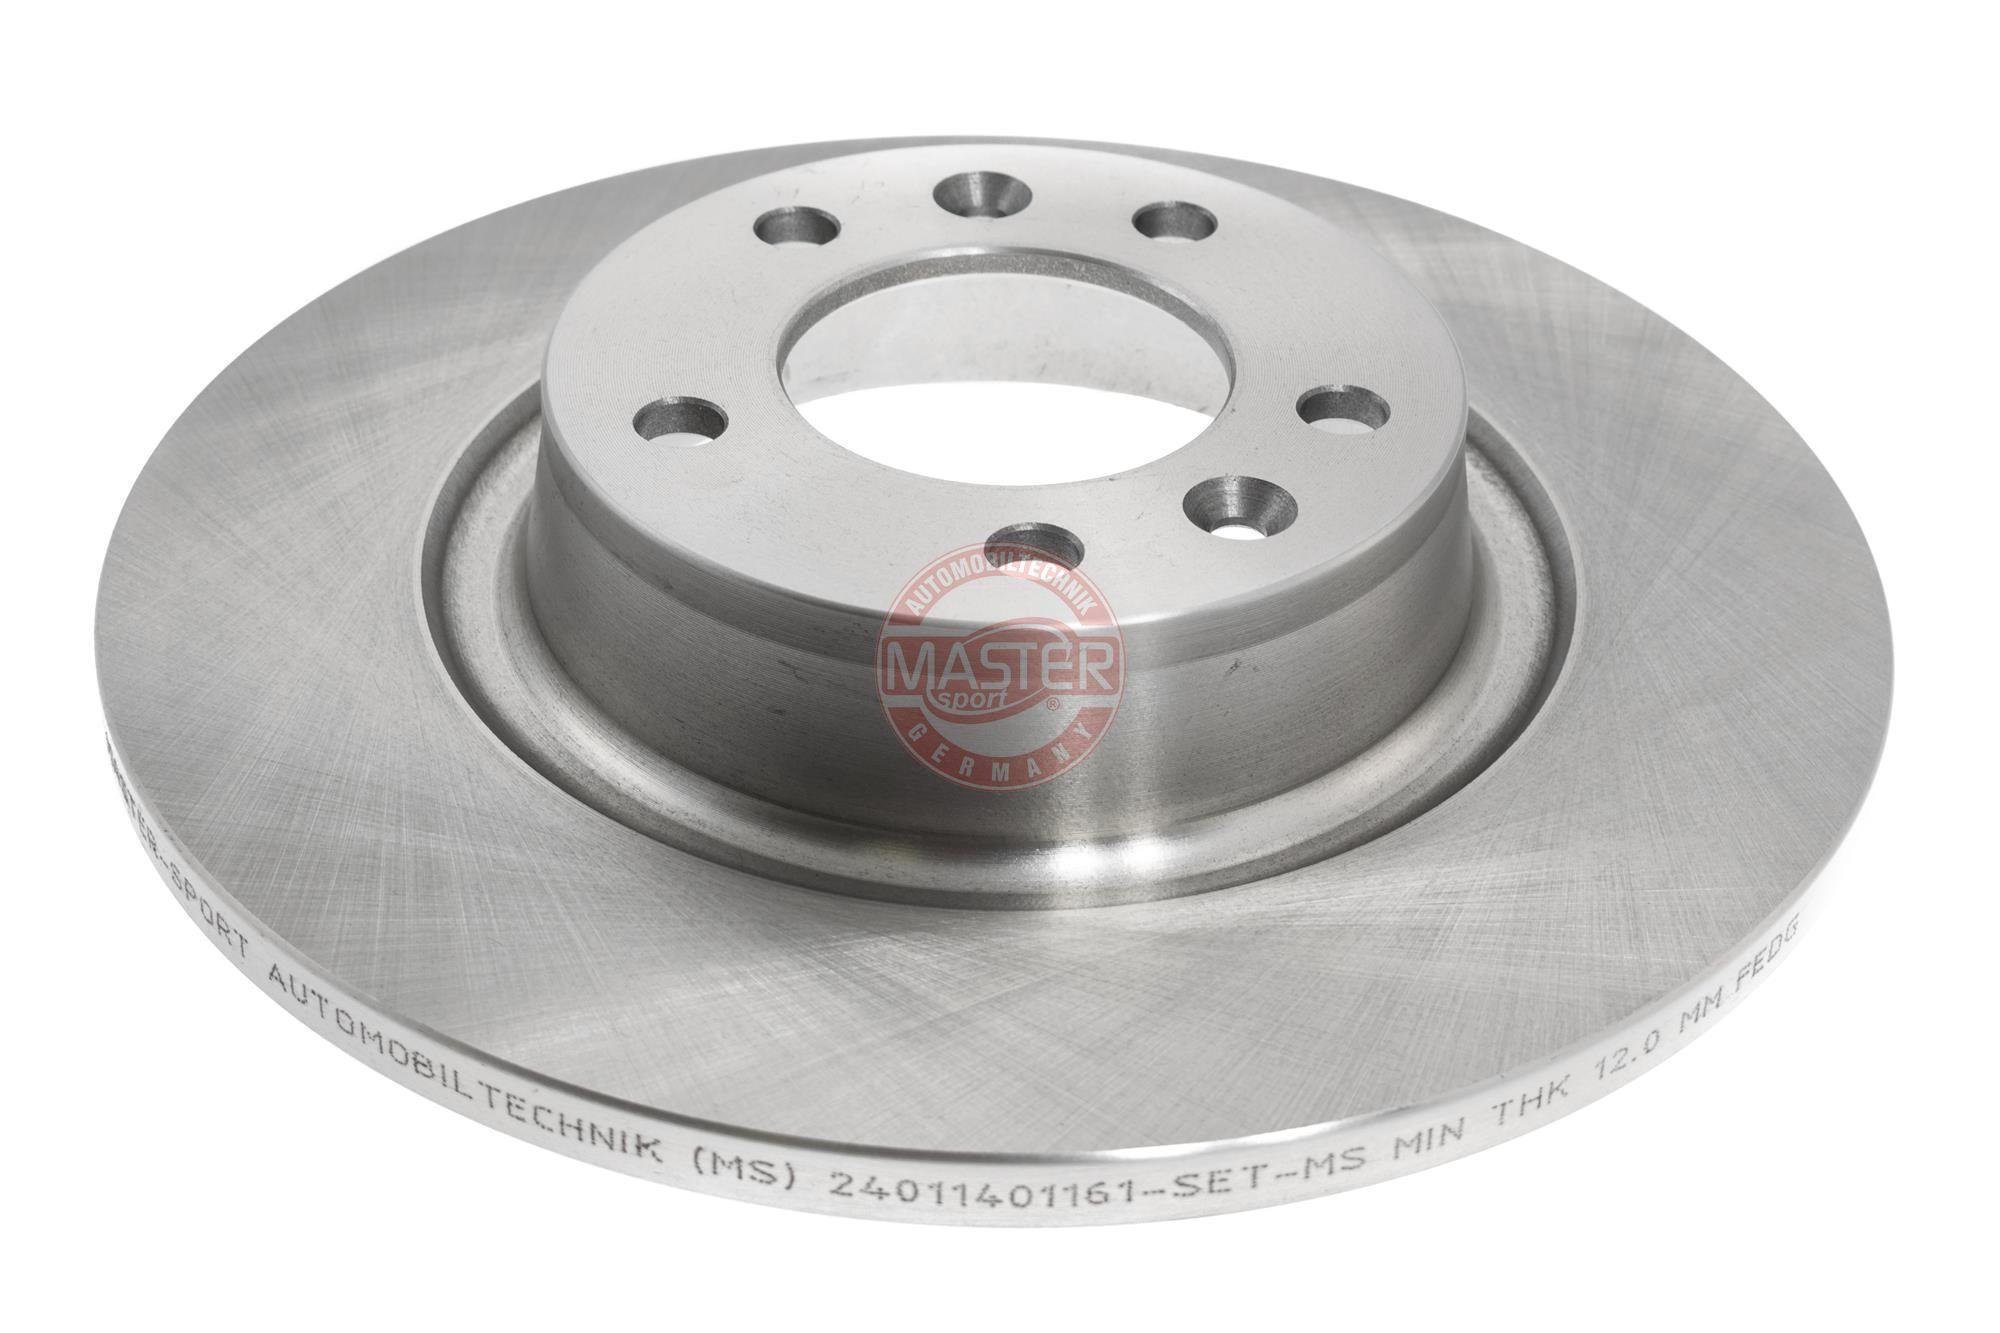 Bremsscheibe MASTER-SPORT 24011401161-PCS-MS